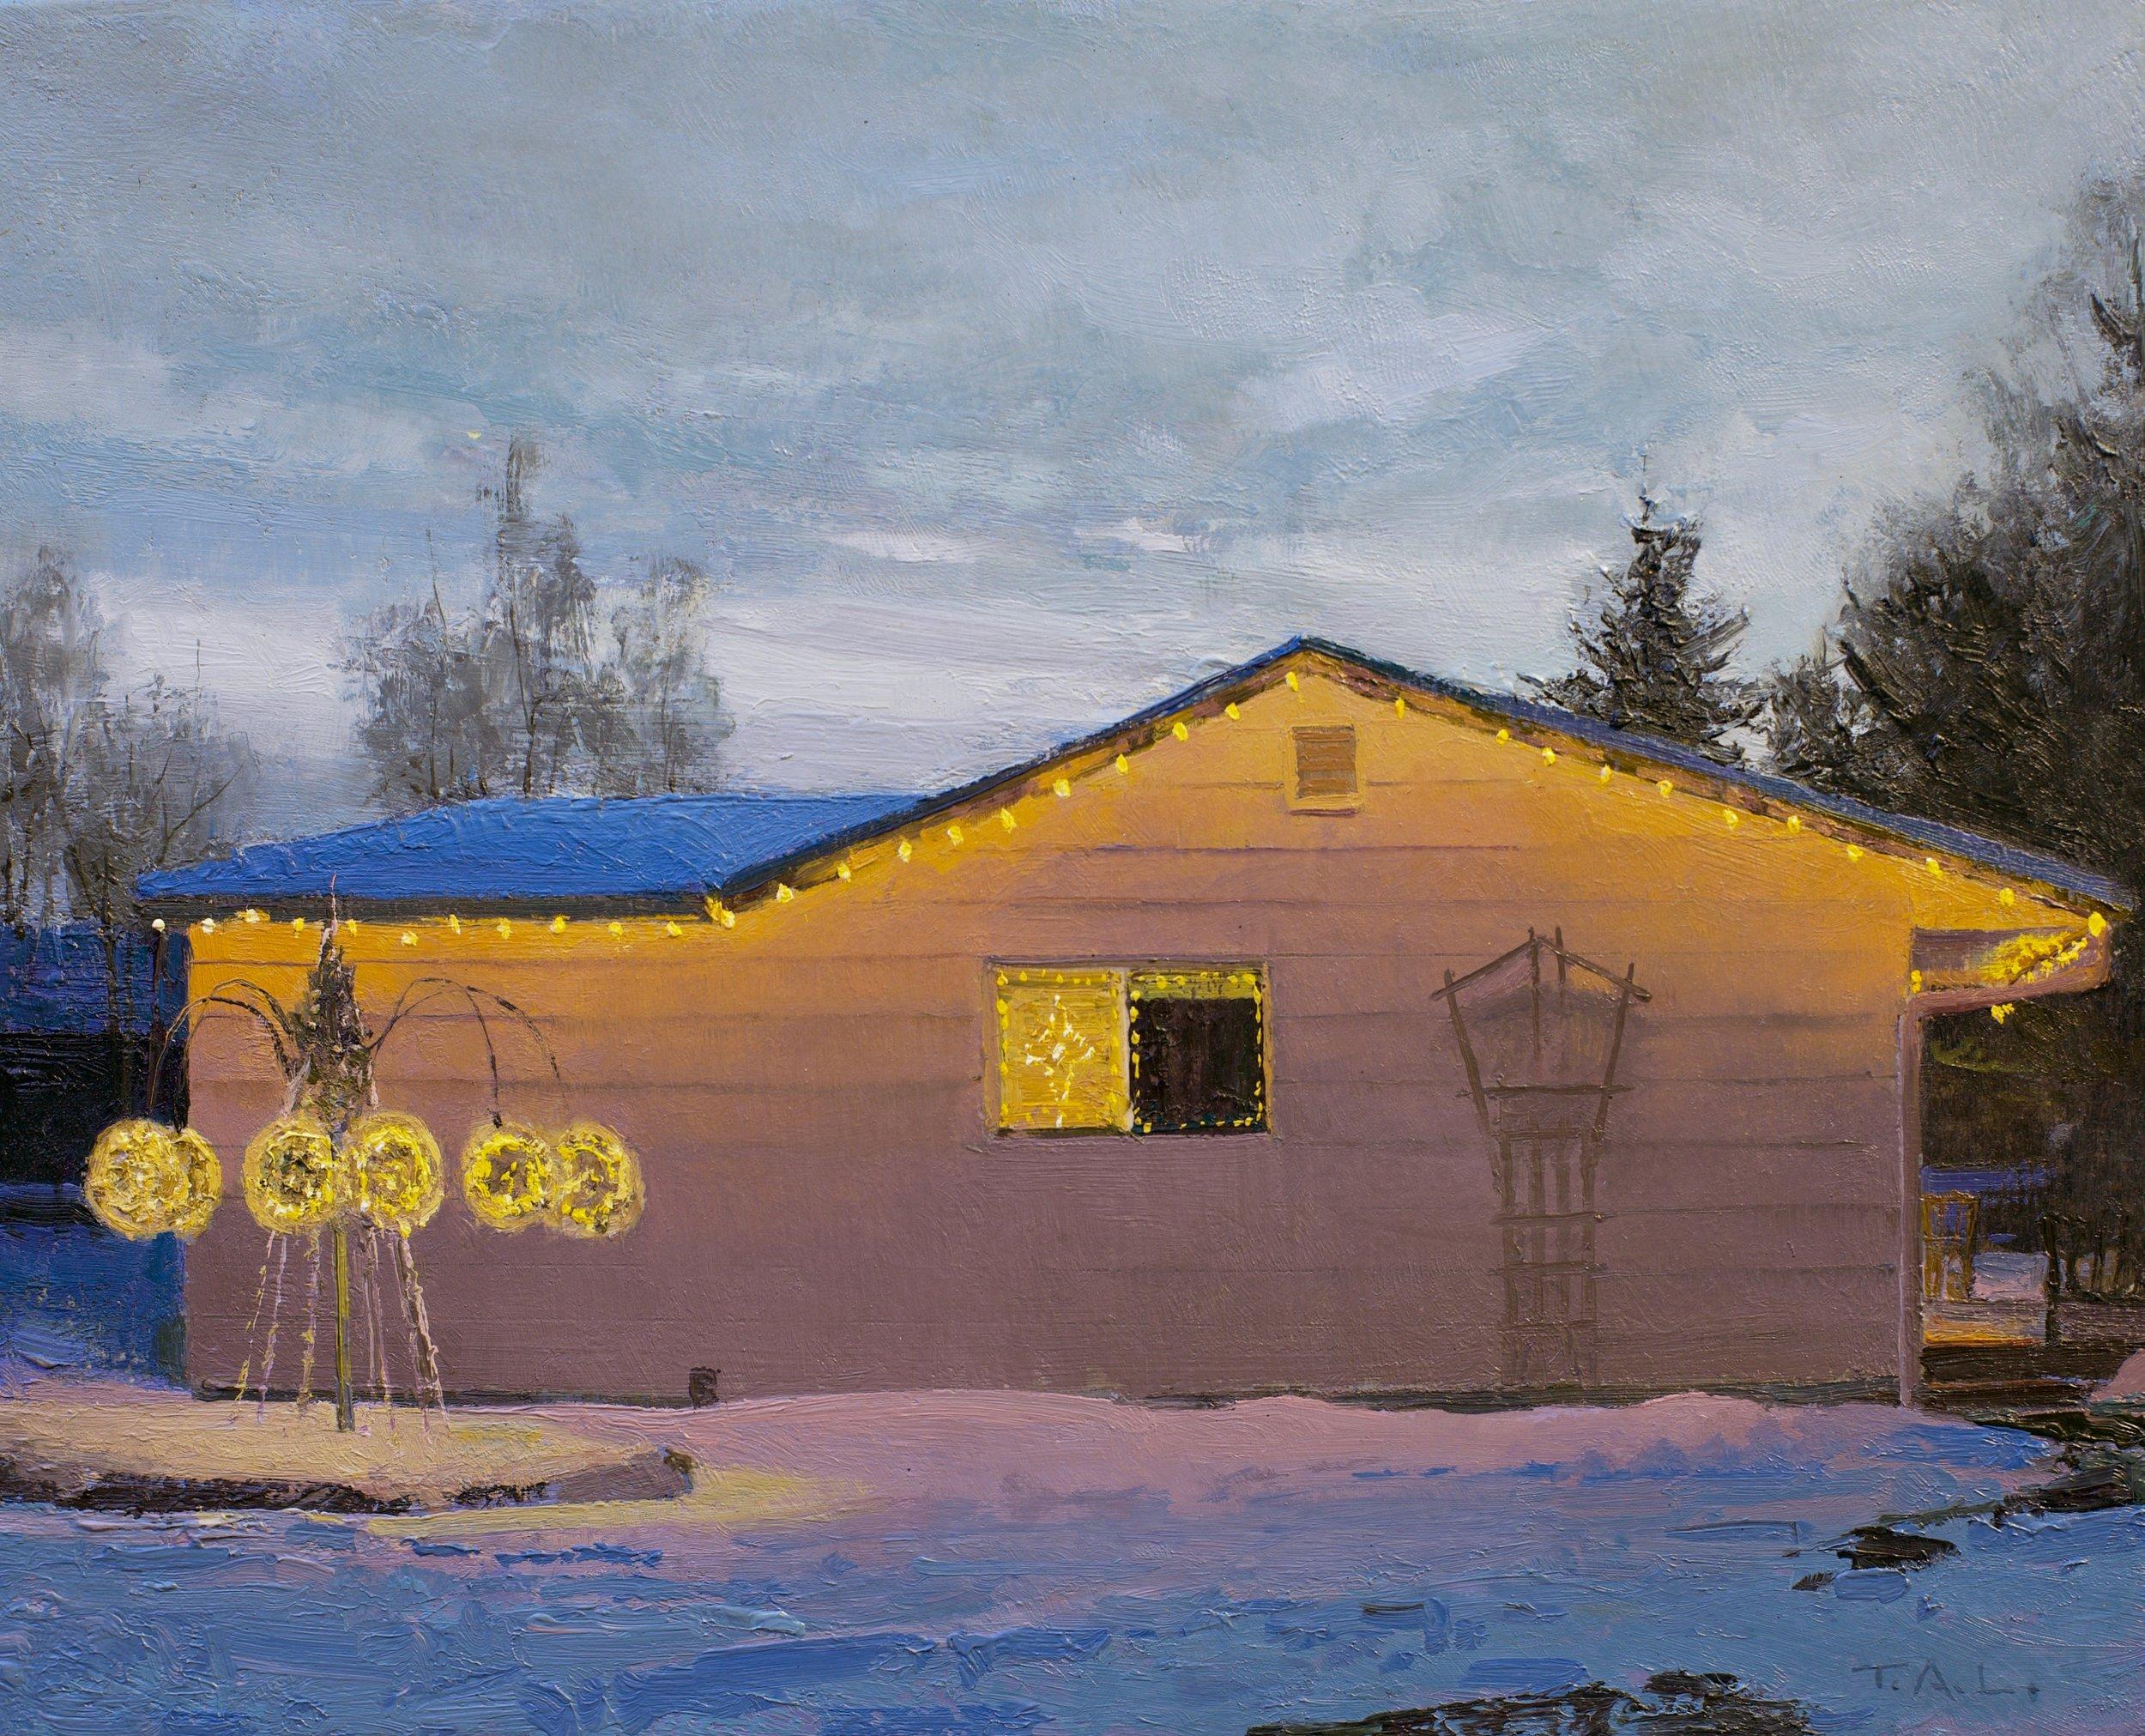 Winter Solstice, oil on panel, 8.5 x 10.5 in.